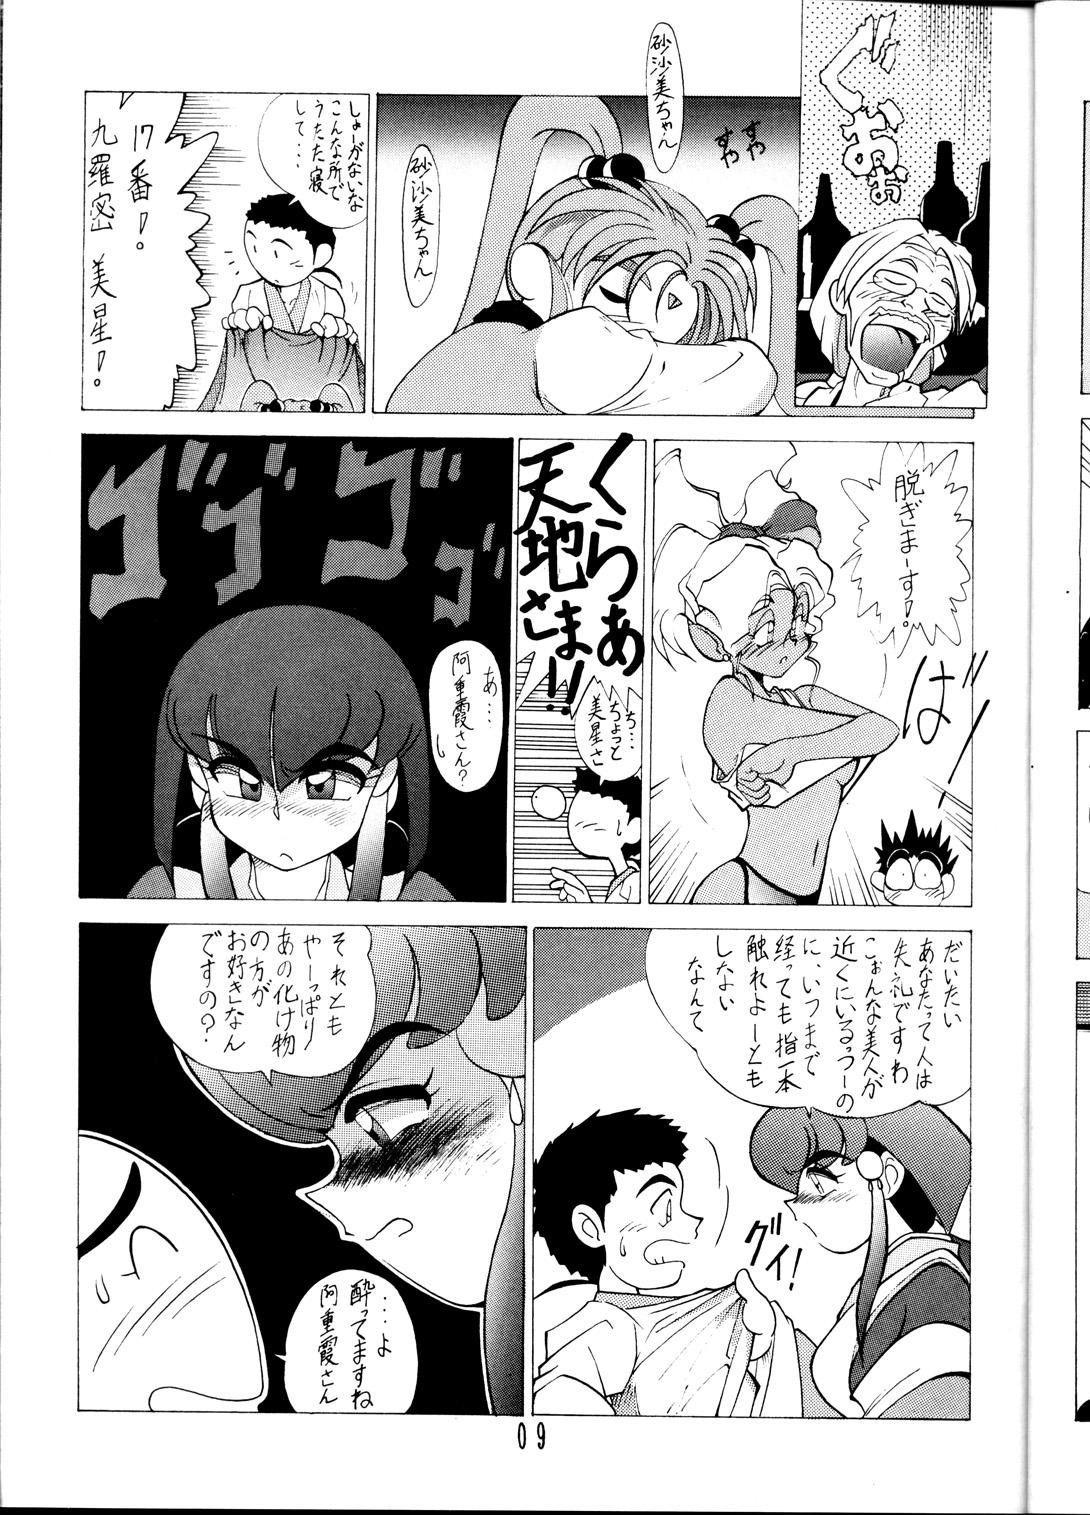 Tenchi Muyou! Sample Vol 6 7